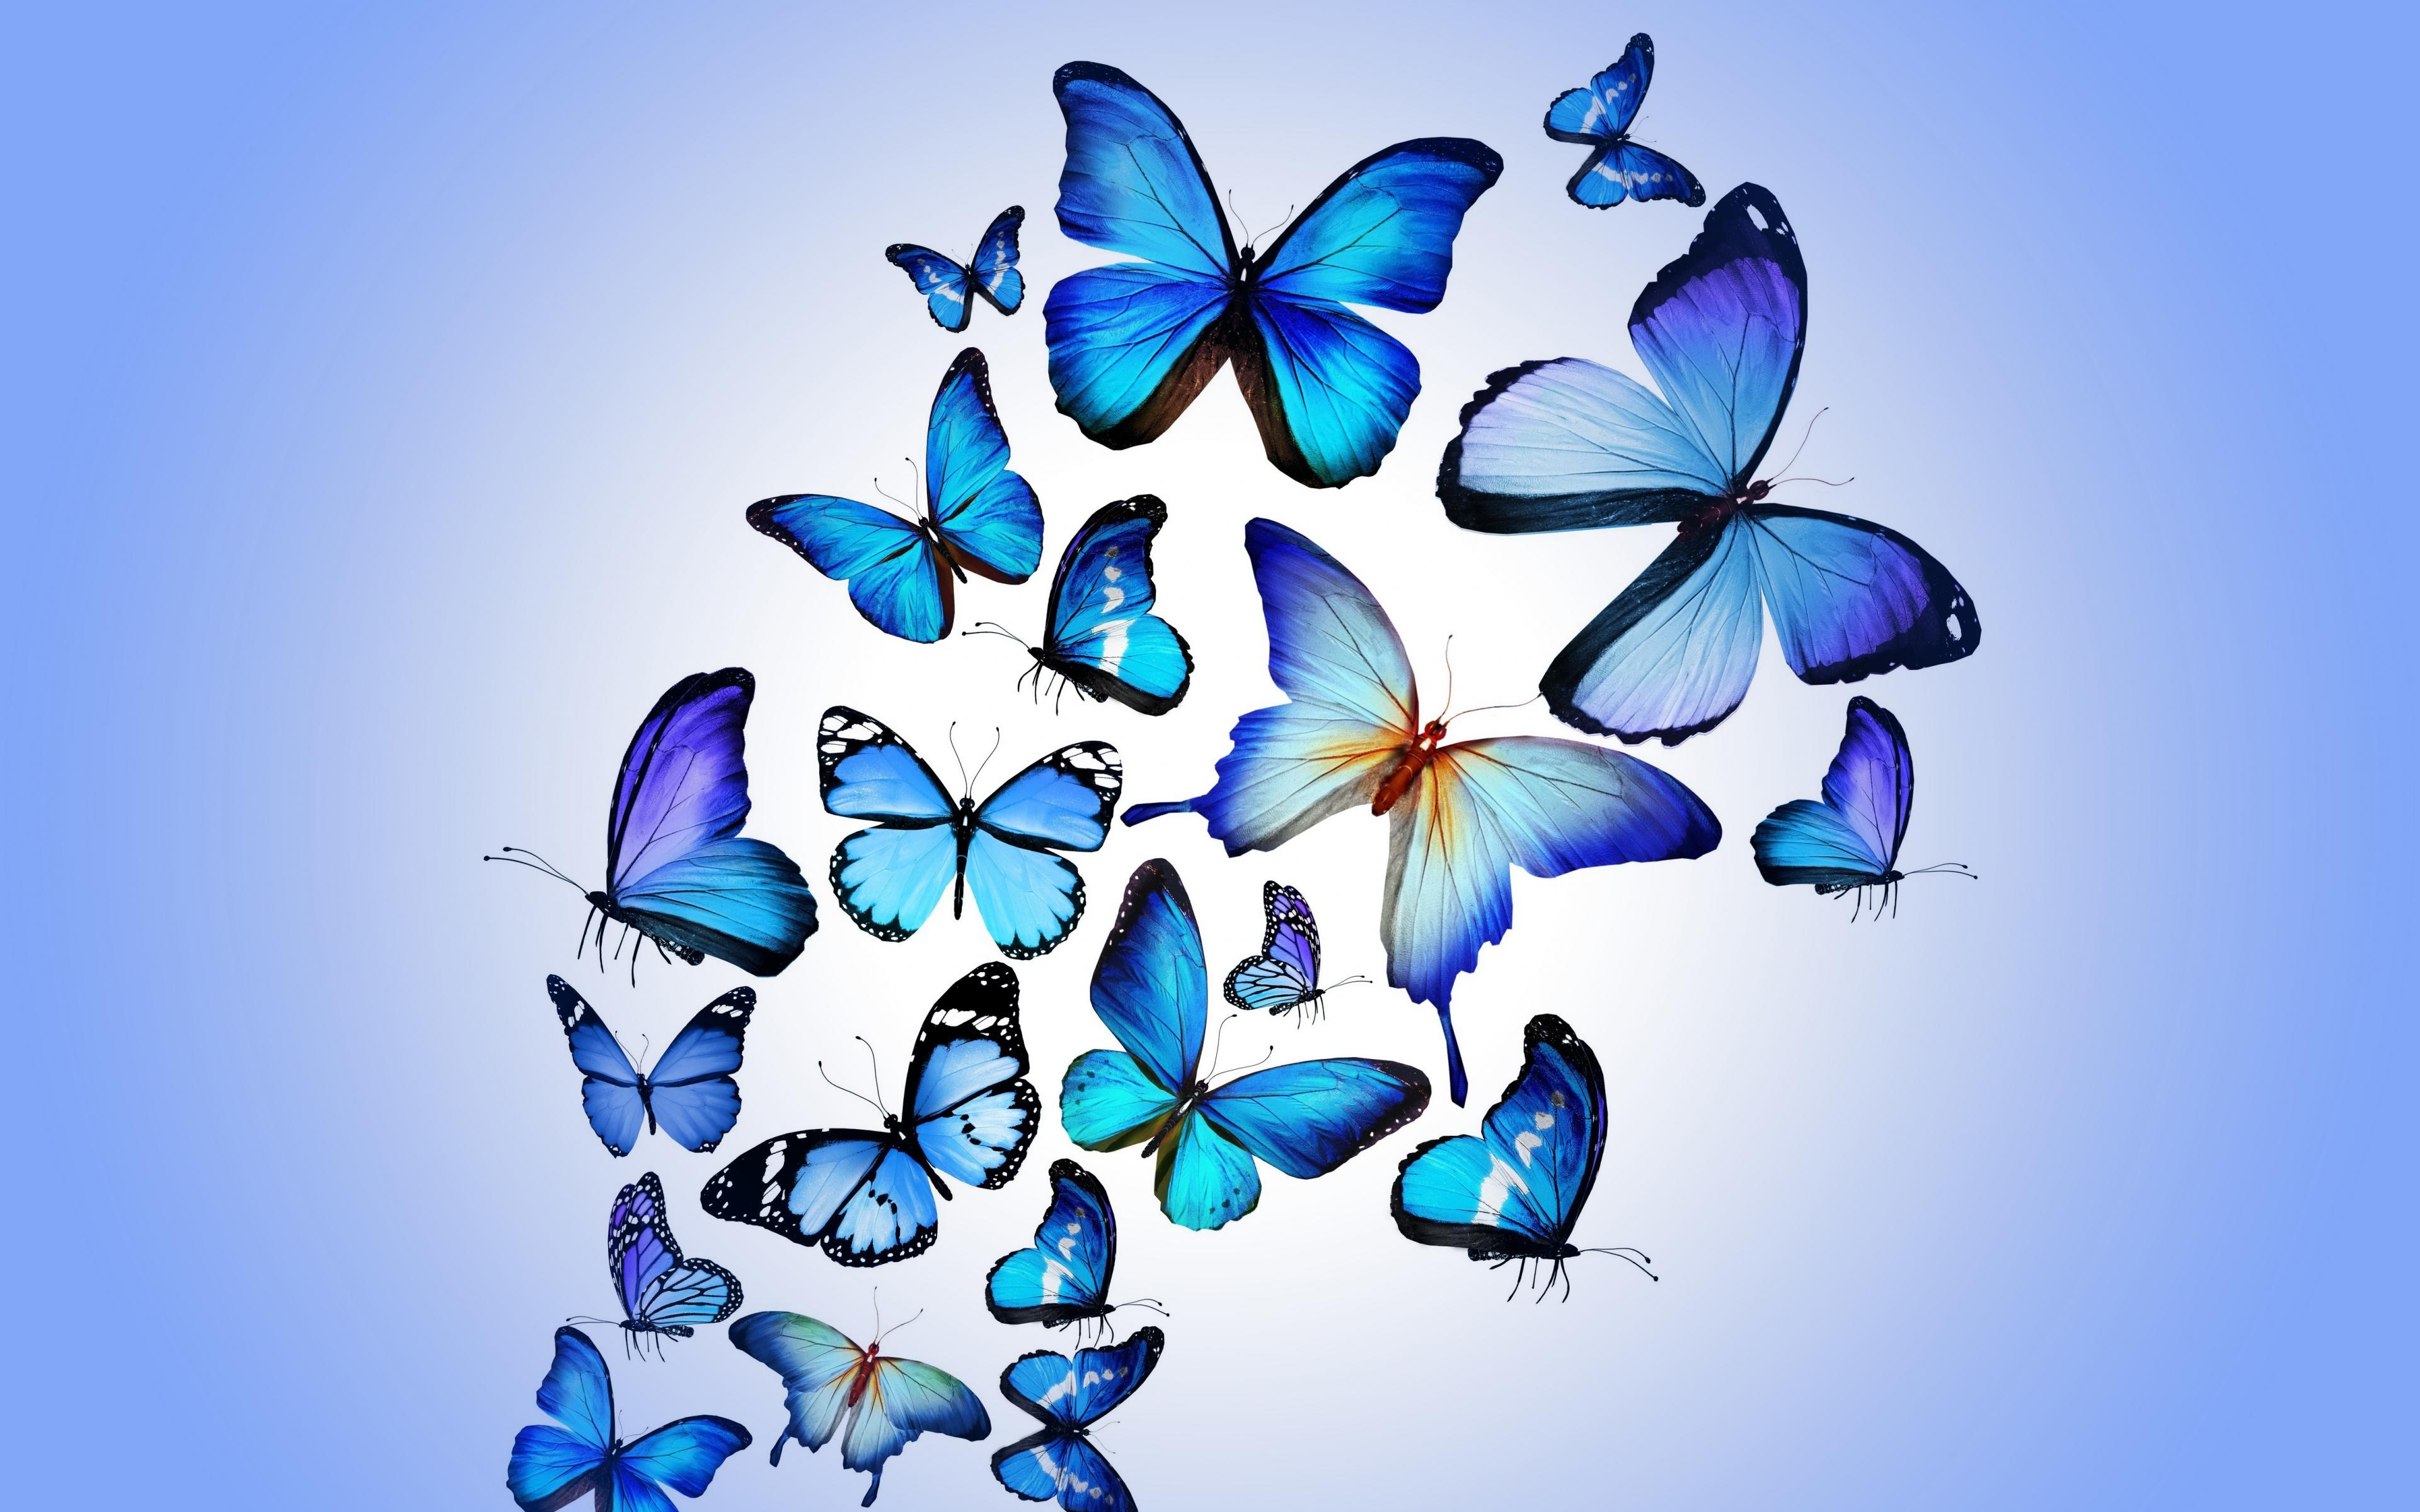 Real Art Design Group : Butterfly art hd artist k wallpapers images